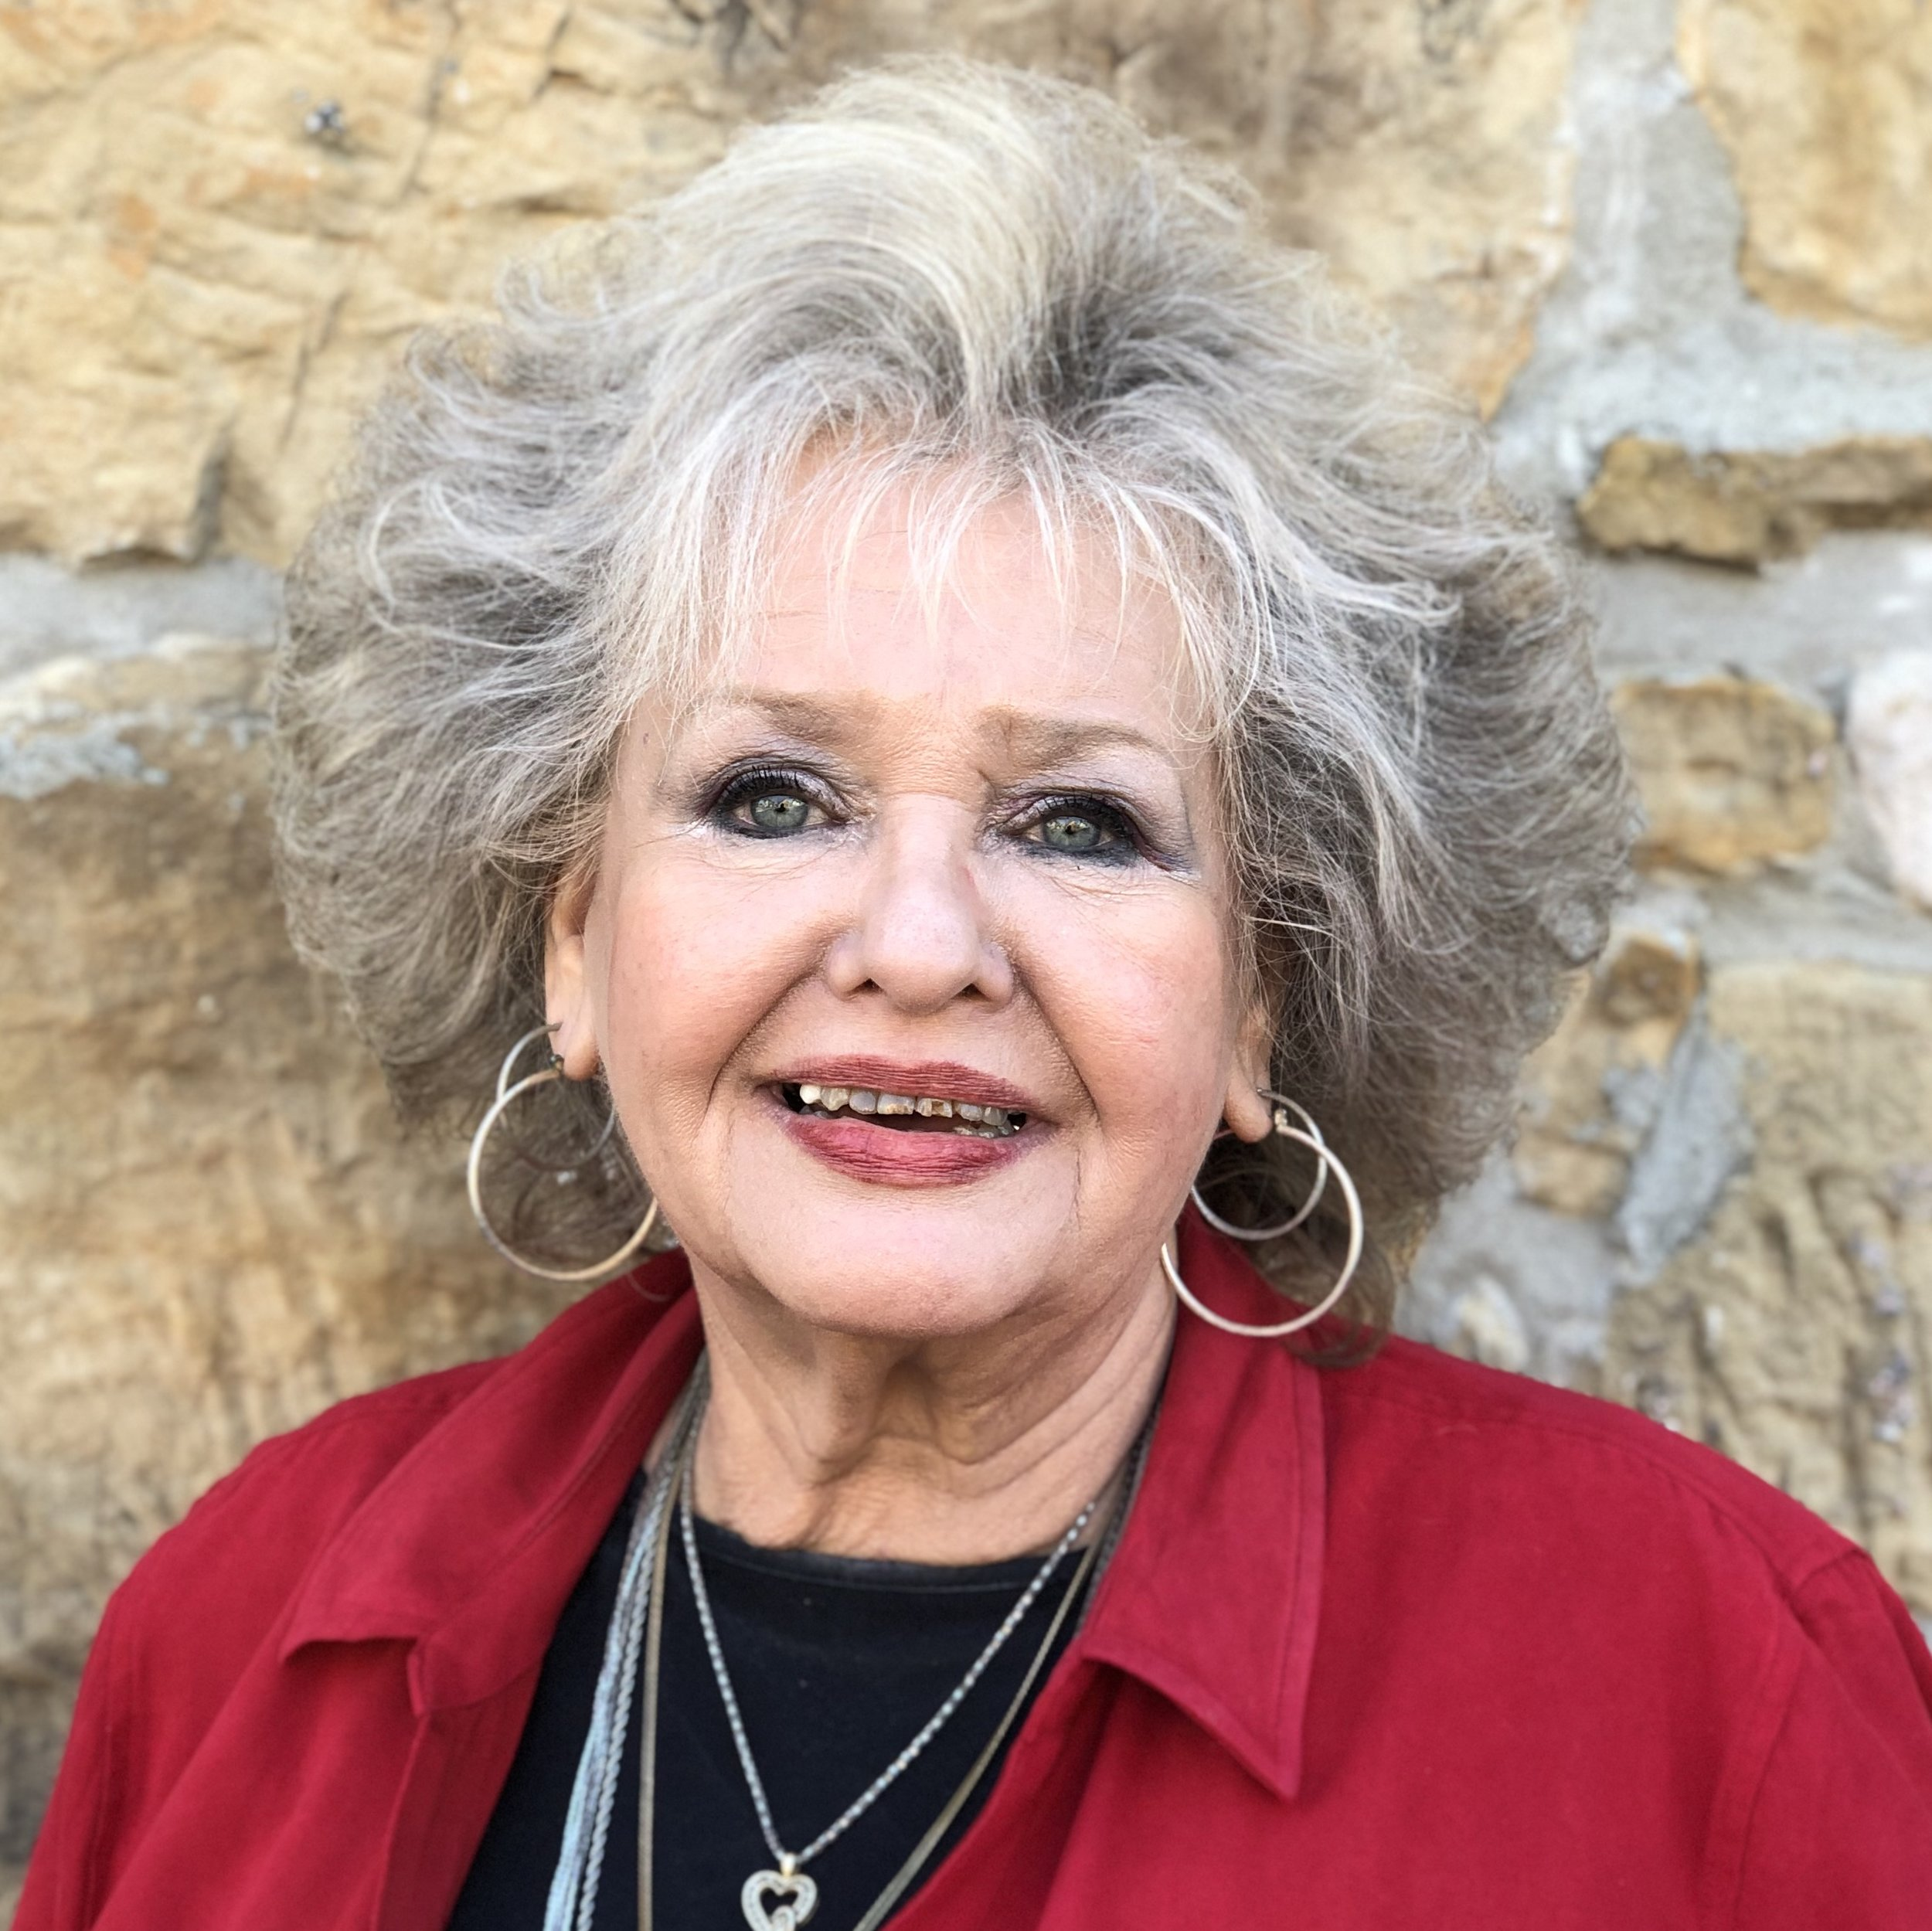 Didi Scroggins - Hair Stylist